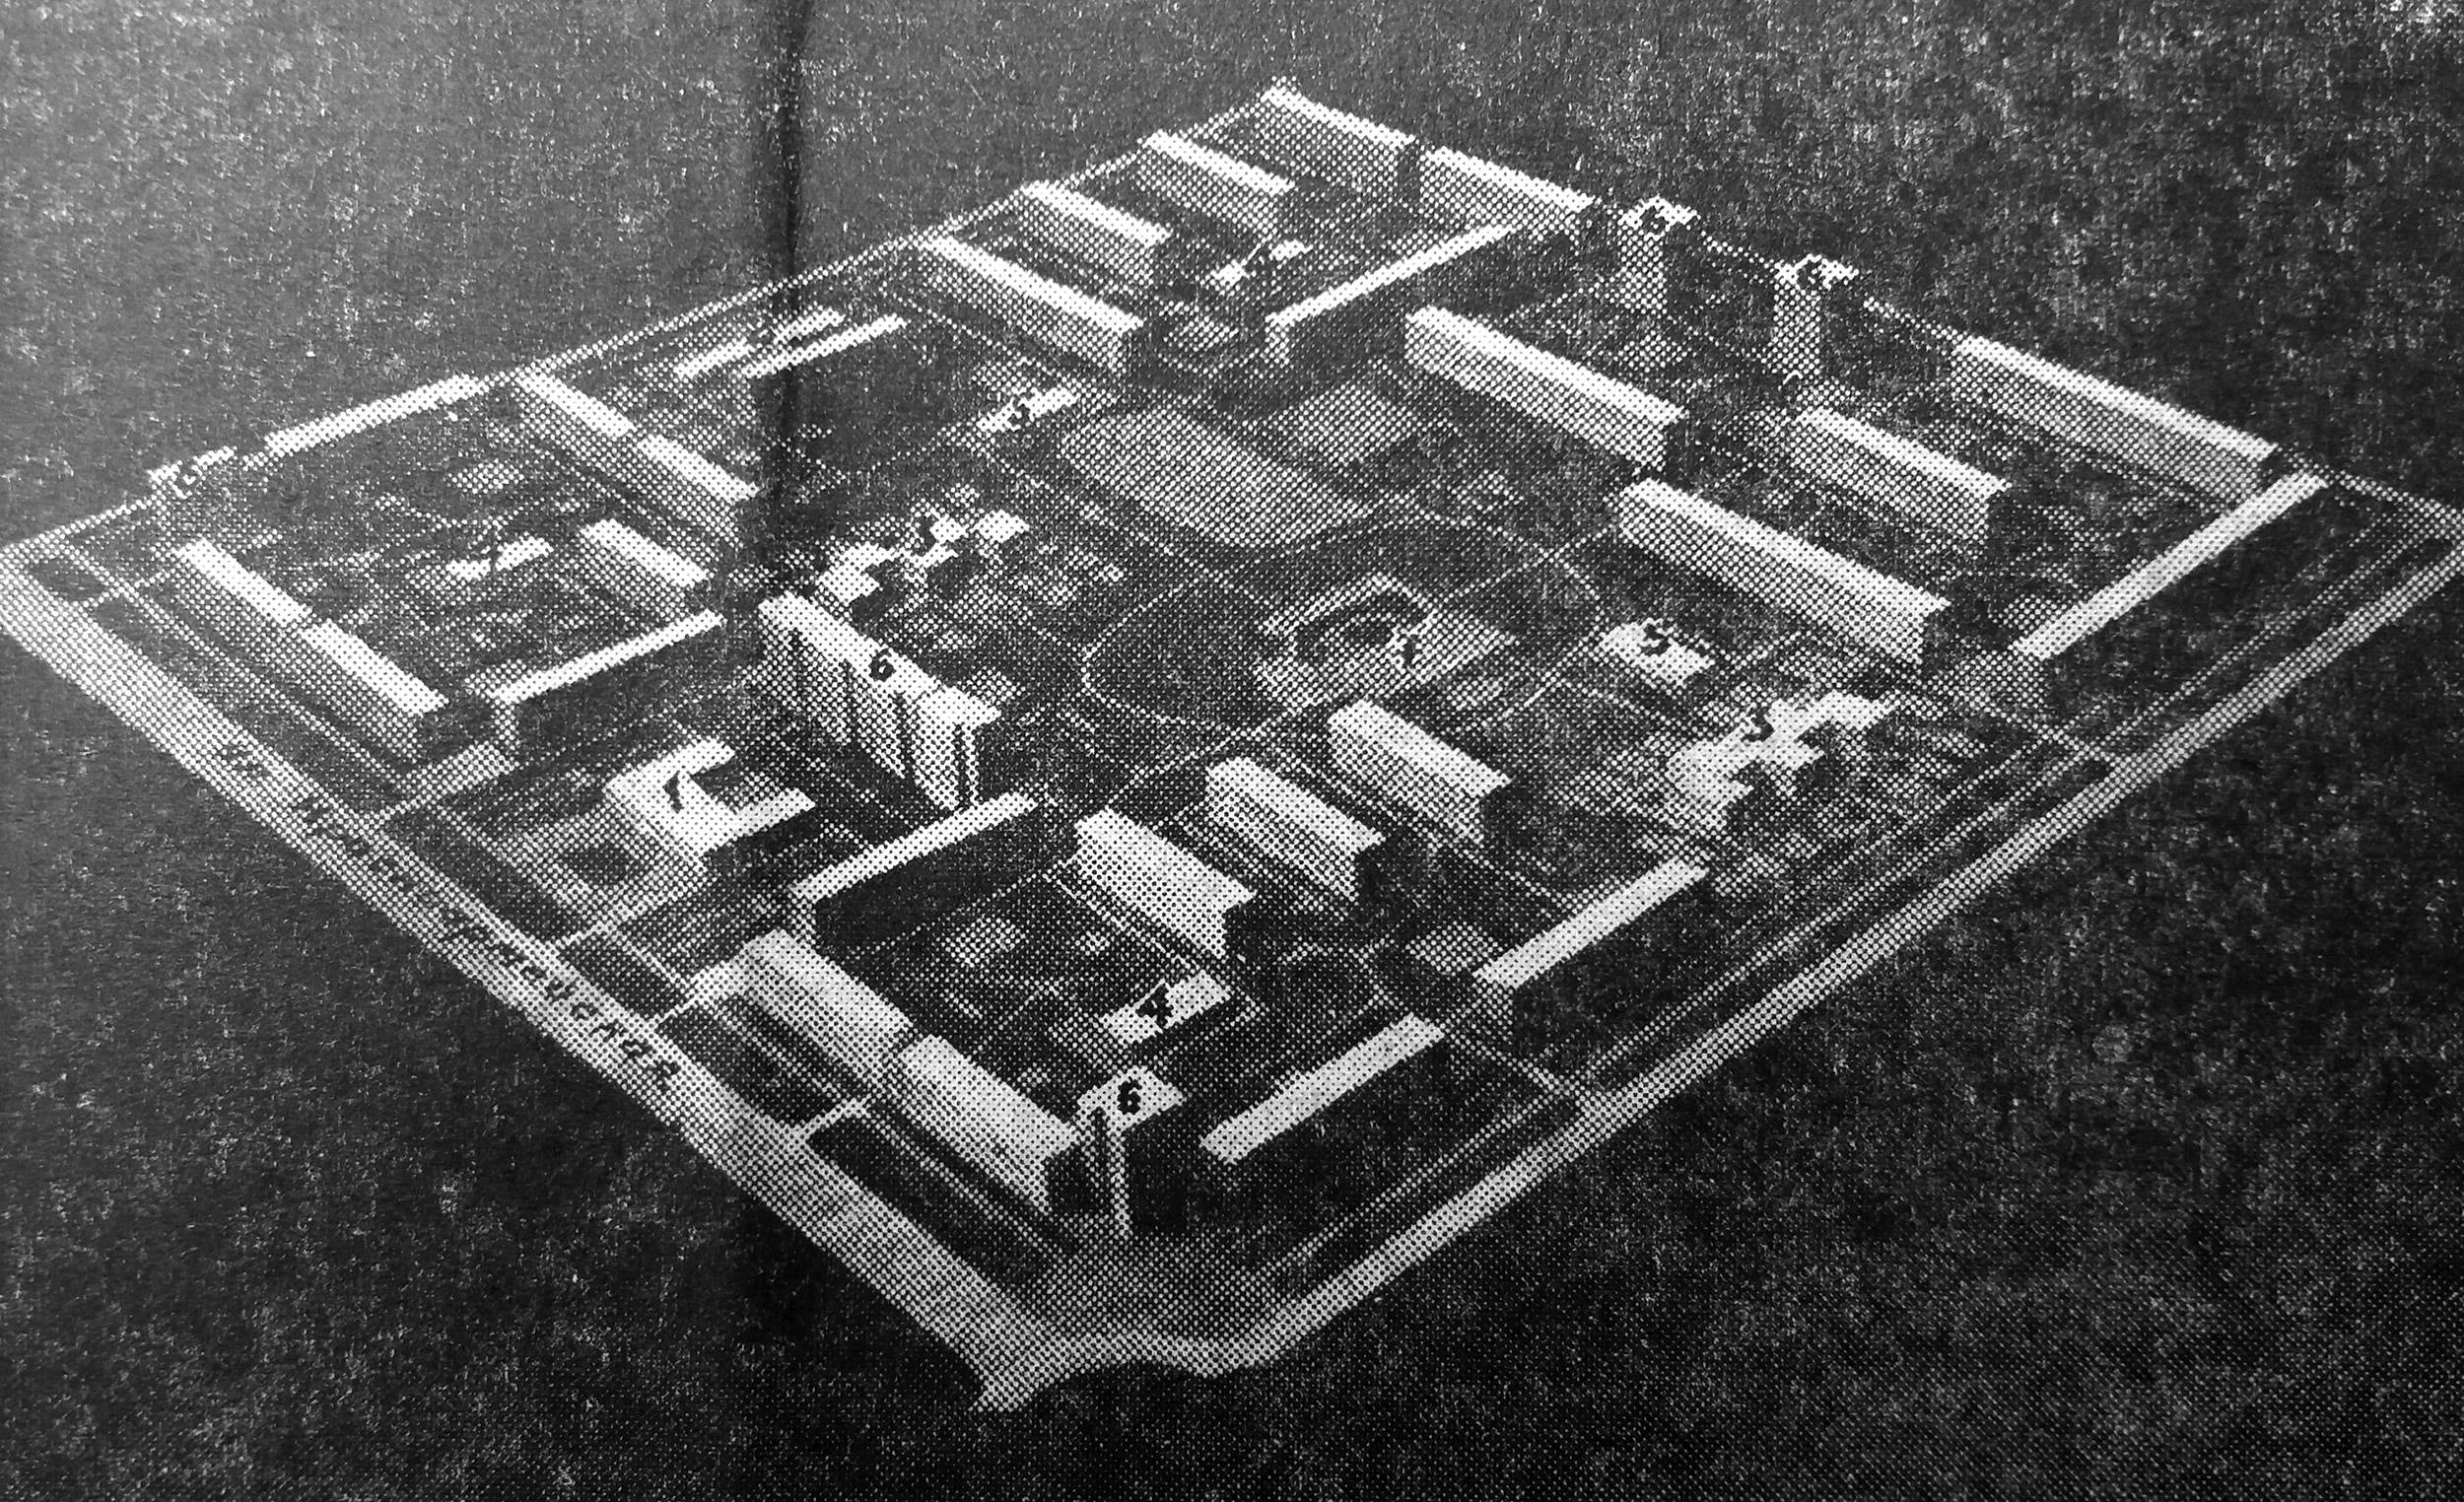 На снимке: макет второго микрорайона Брянска. Фото А. Александрова.